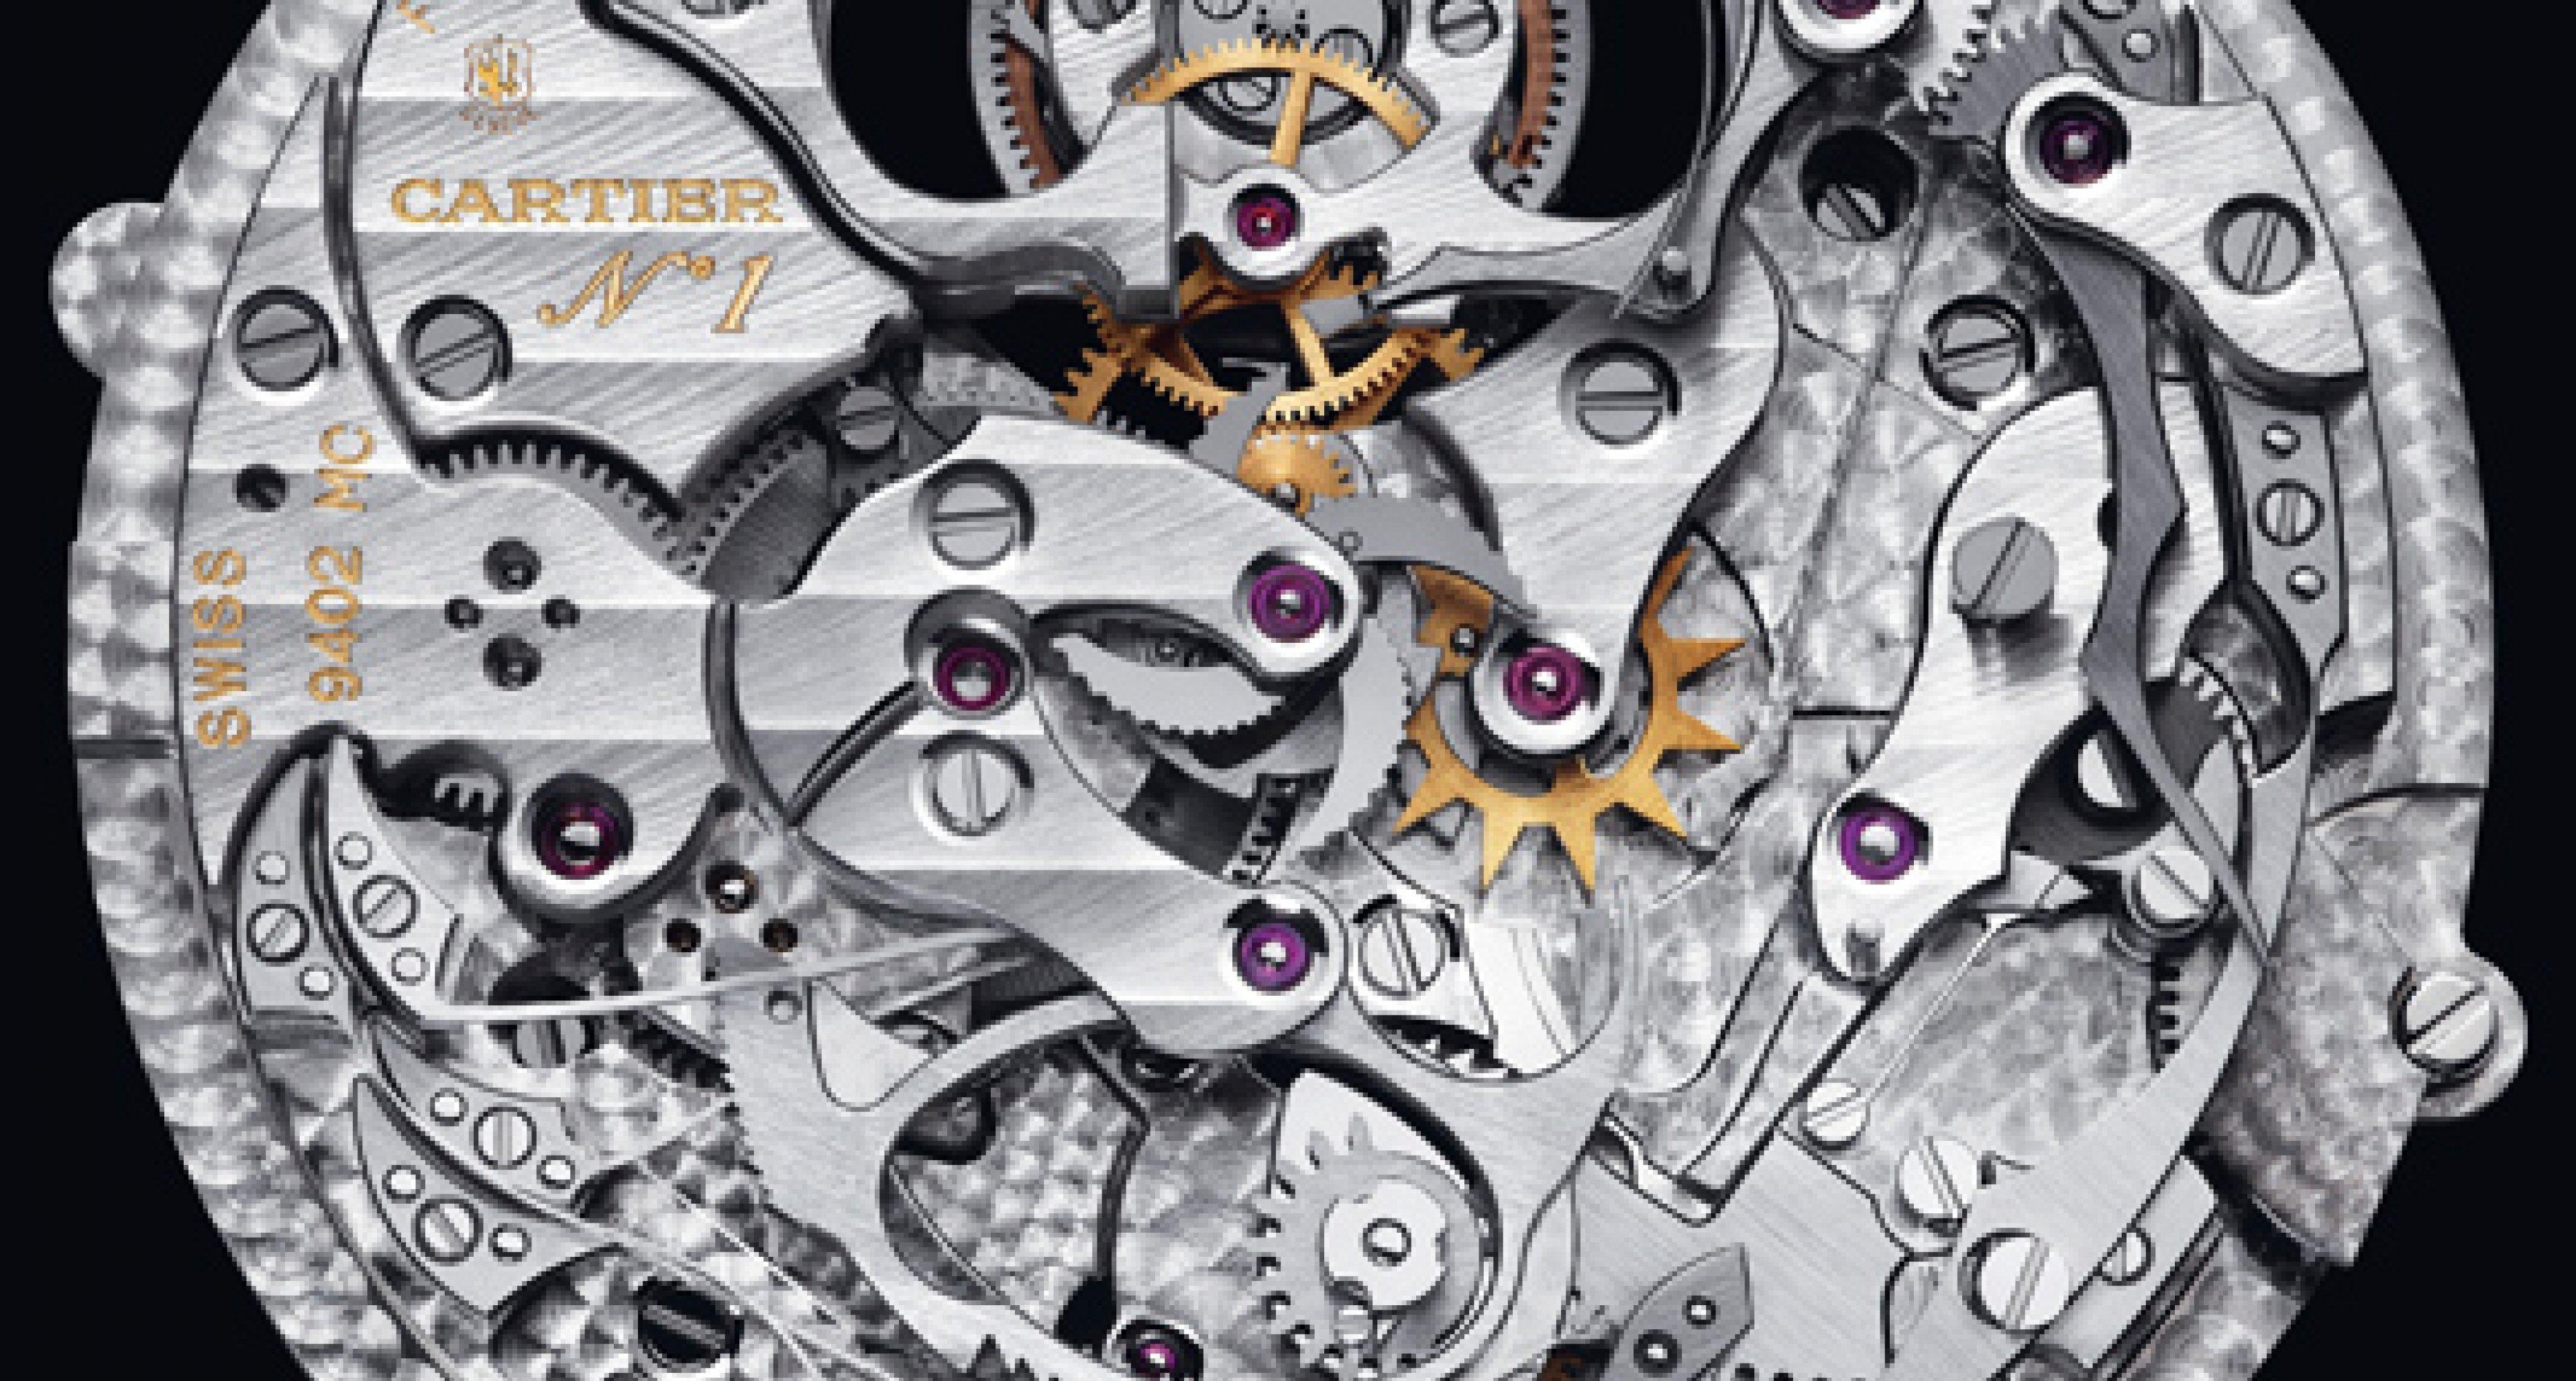 SIHH 2012: Rotonde de Cartier Minute Repeater Flying Tourbillion